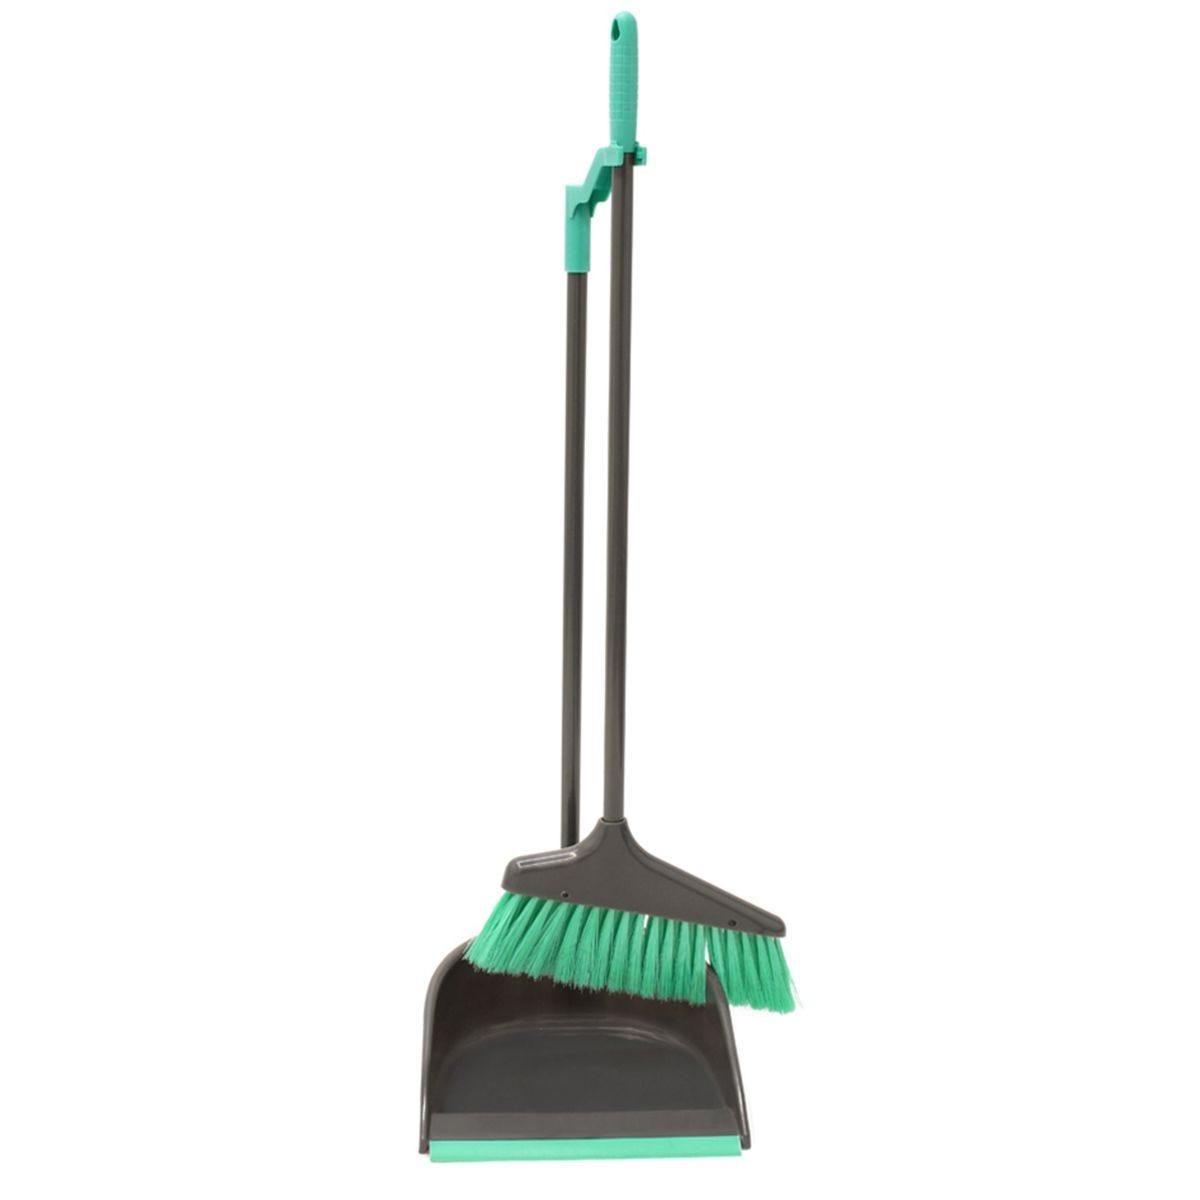 JVL Long Handle Dustpan and Bristle Brush Set Grey/Turquoise